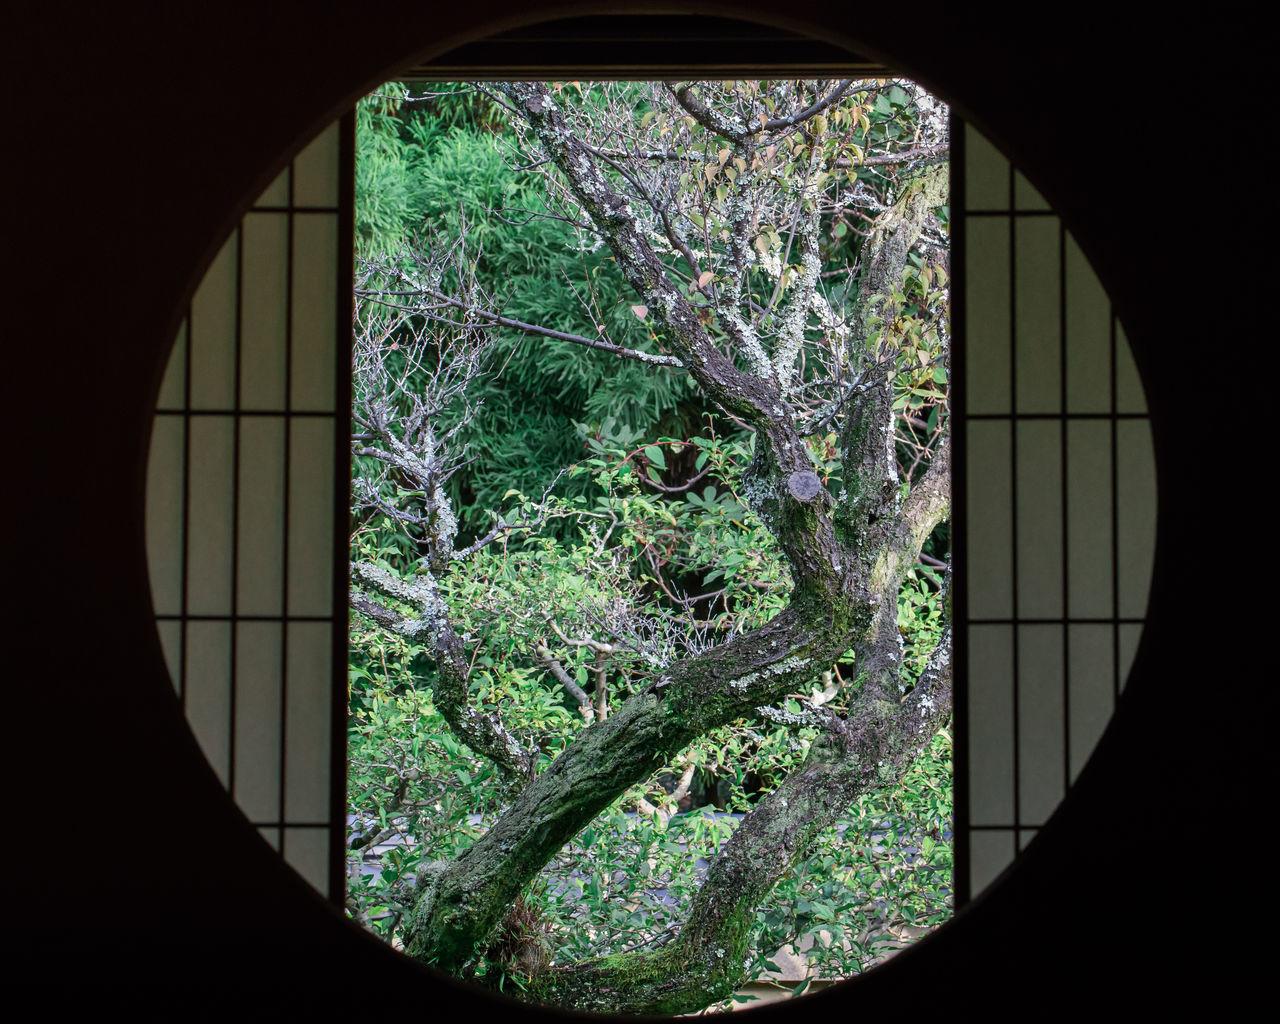 Architecture Calm Culture Day Garden Indoors  Japanese  Nature No People Plant Silence Summer Tree Tree Window Zen Zen Garden